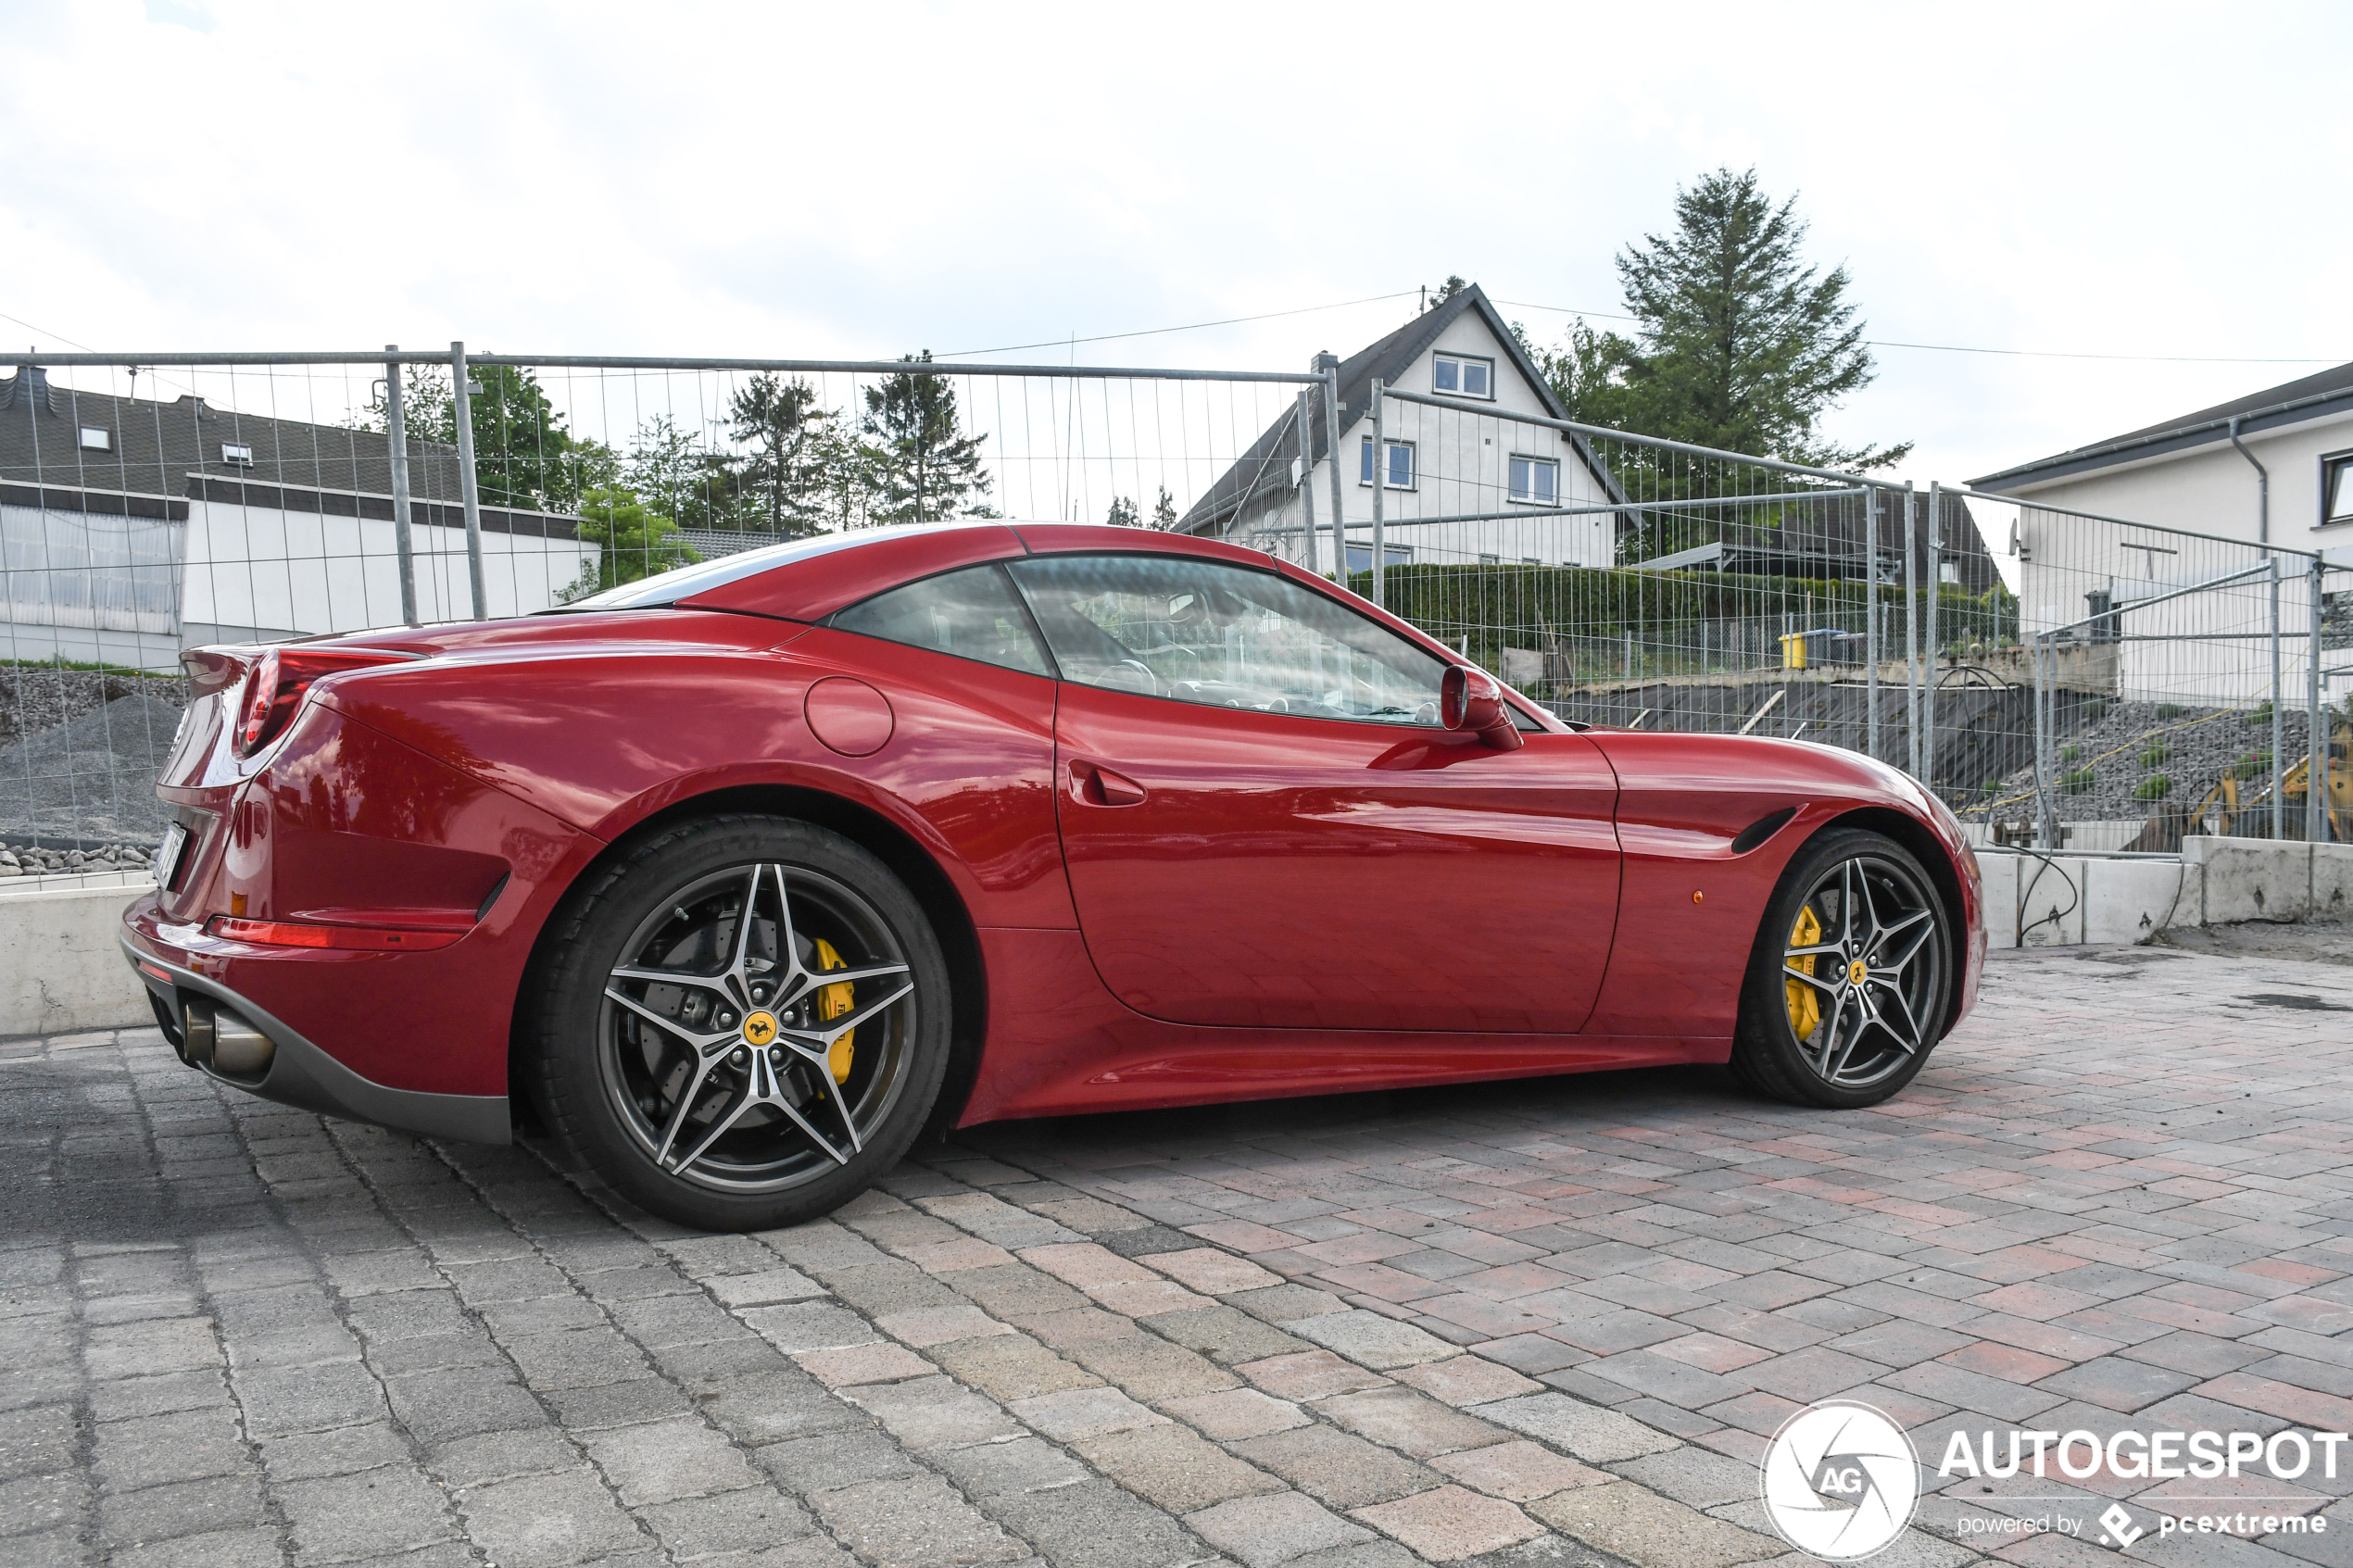 Ferrari California T - 26 mei 2020 - Autogespot